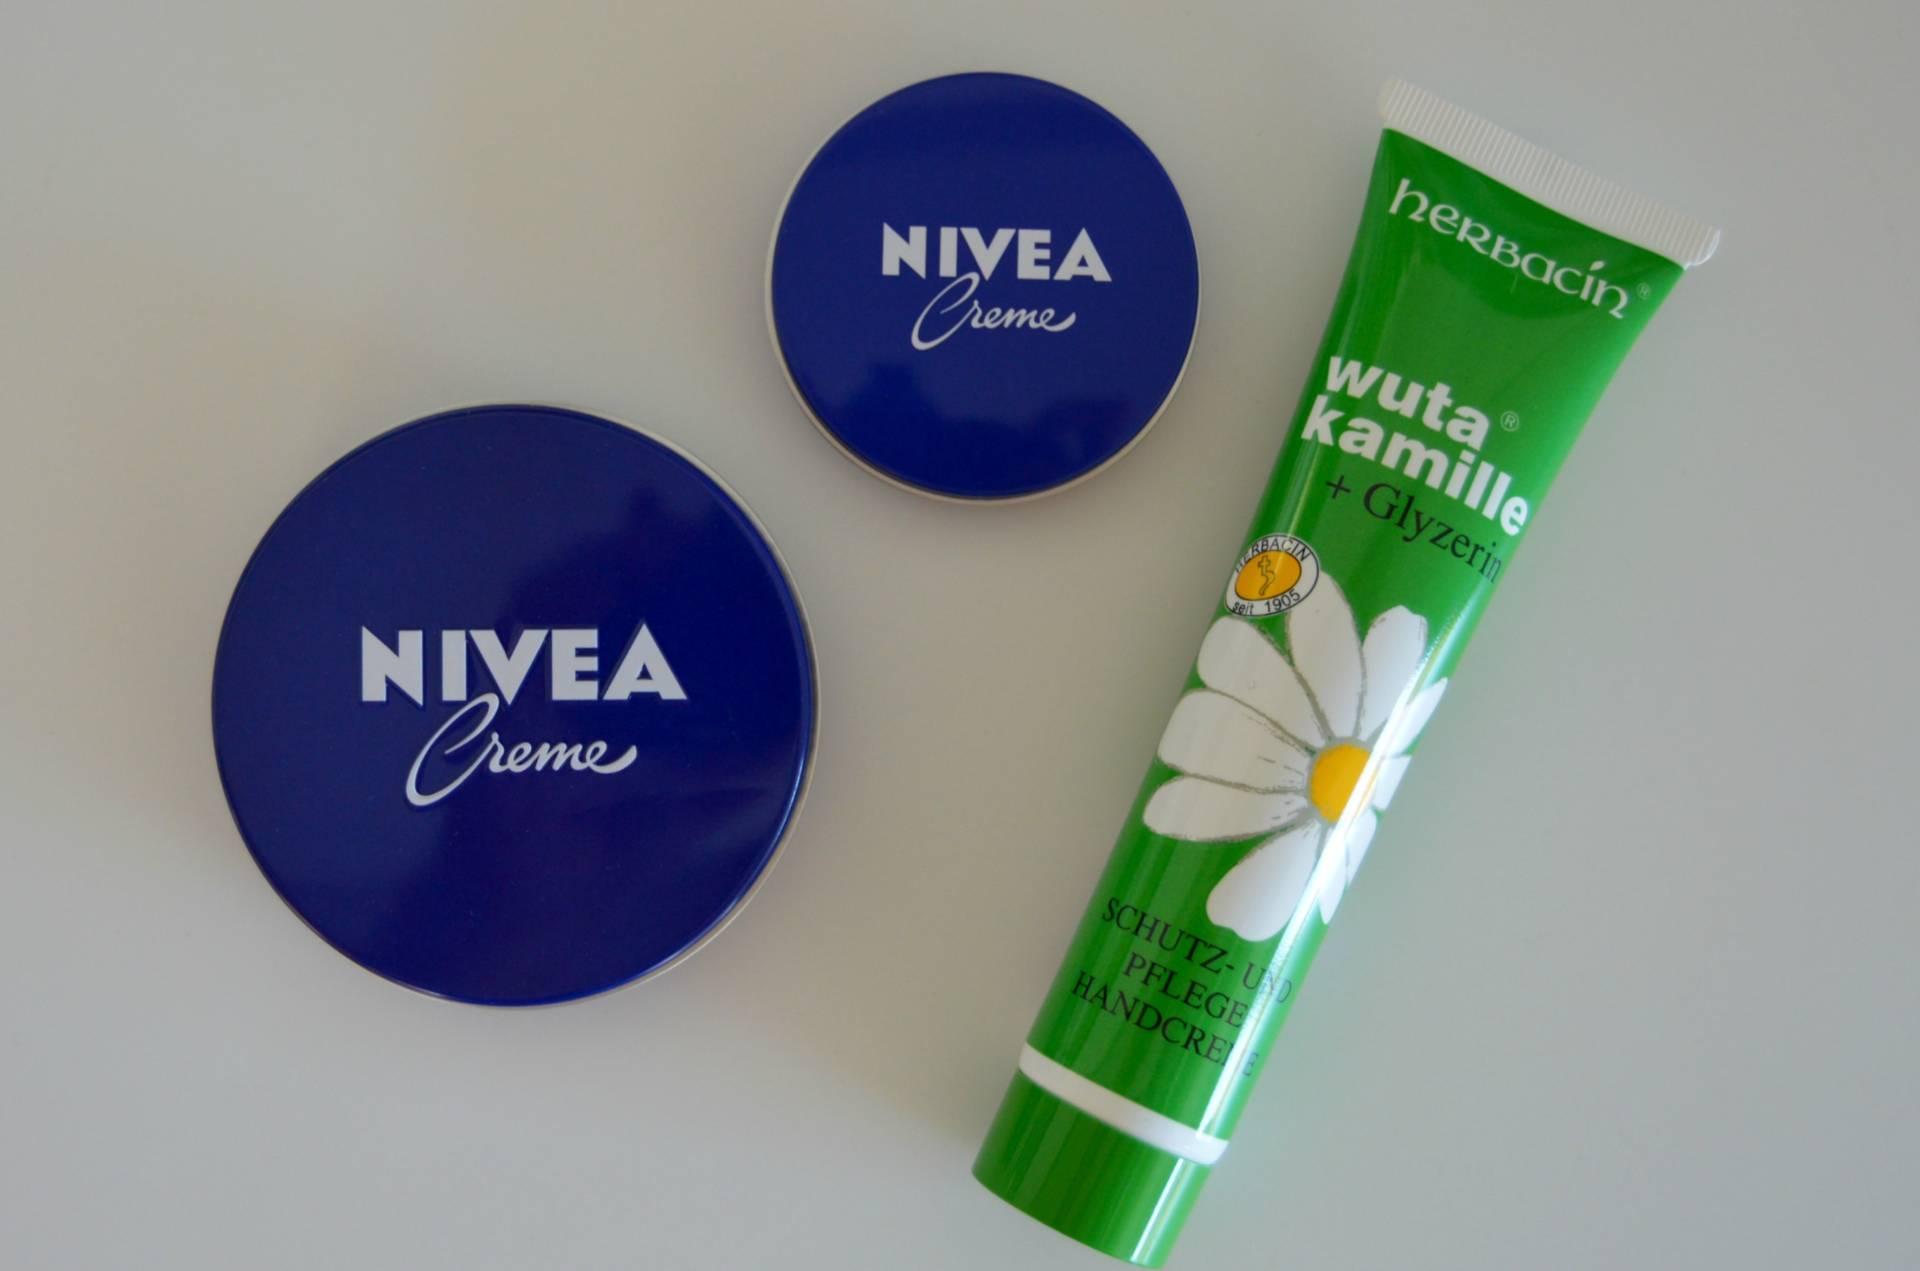 nivea-original-creme-made-in-germany-kamill-hand-cream-herbacin-berlin-tegel-duty-free-shopping-haul-inhautepursuit-travel